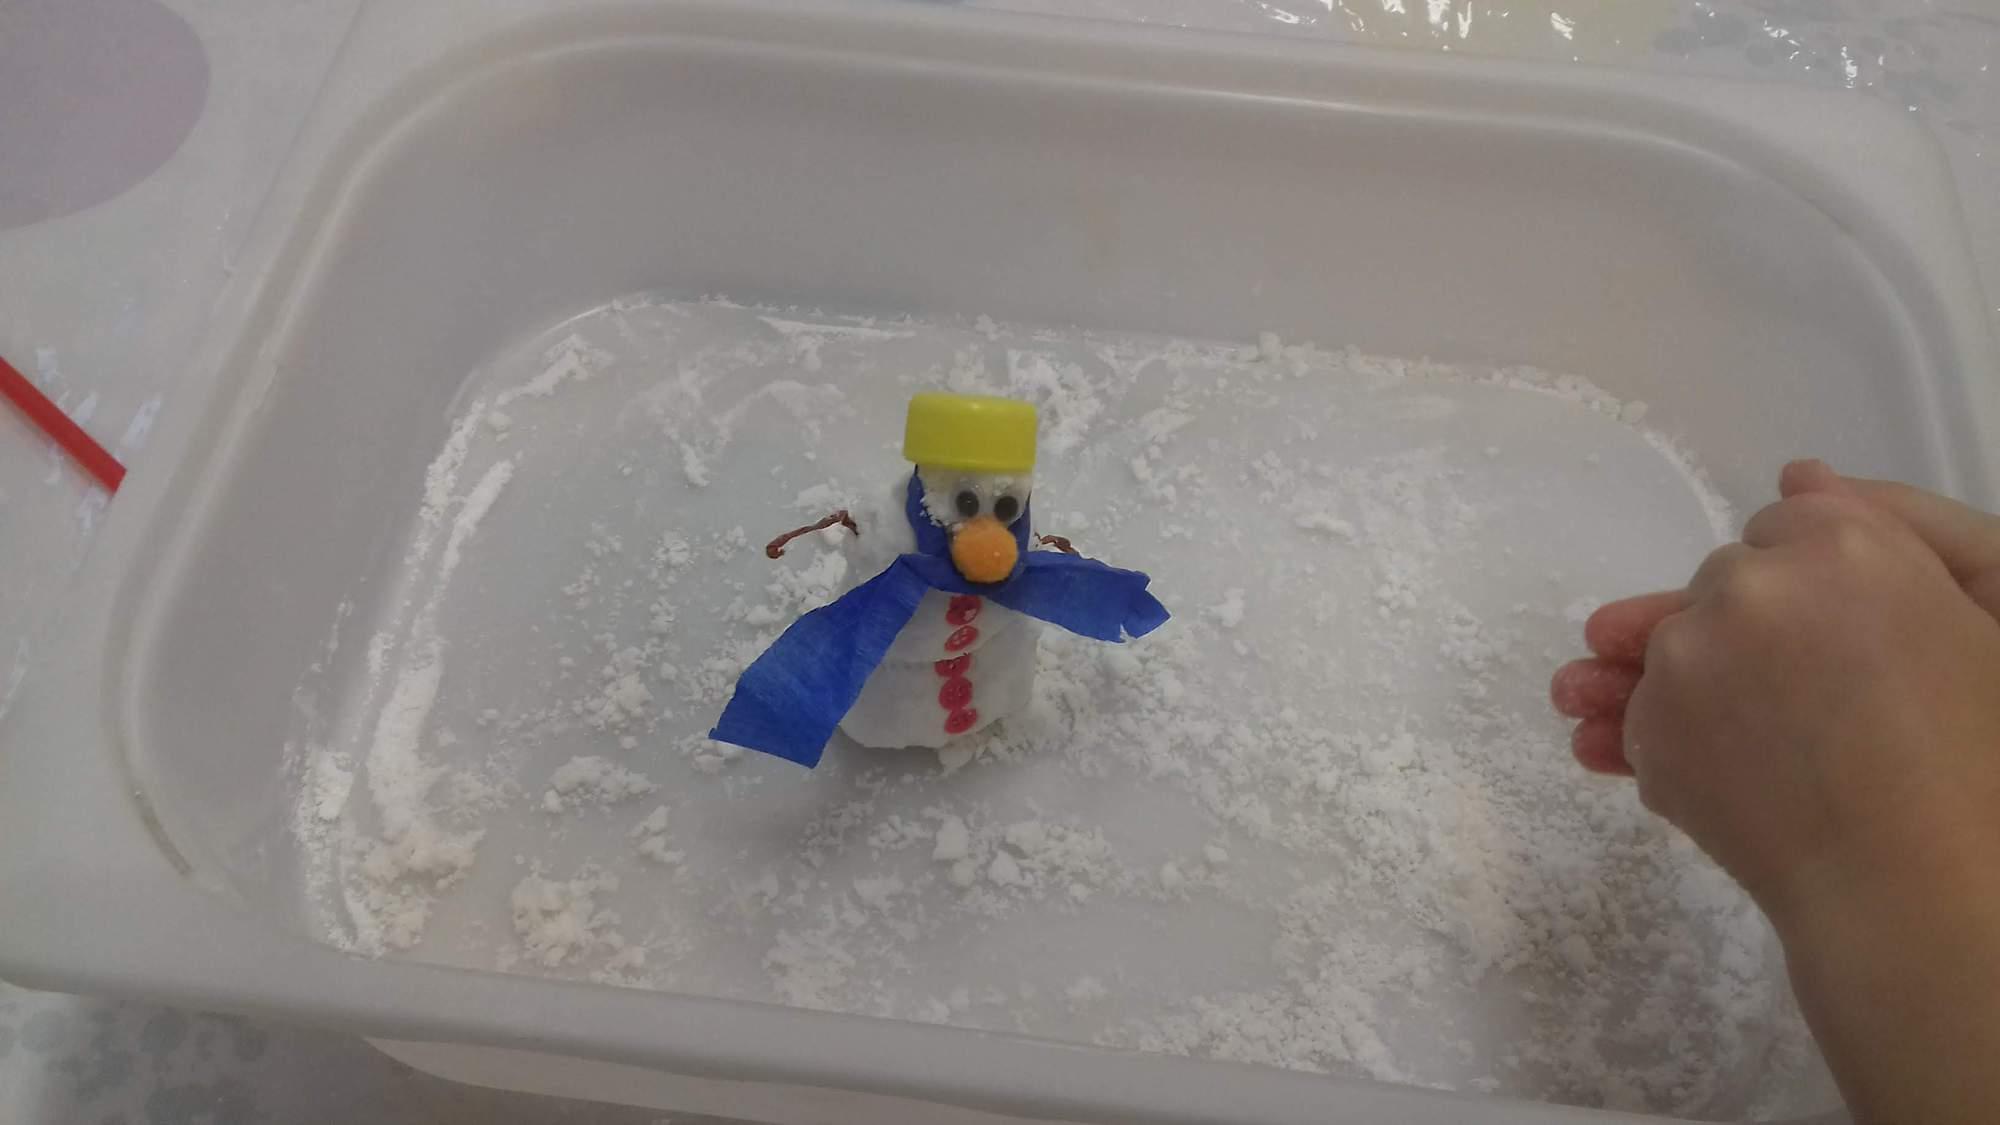 rajce.idnes bath MyPornSnap.top